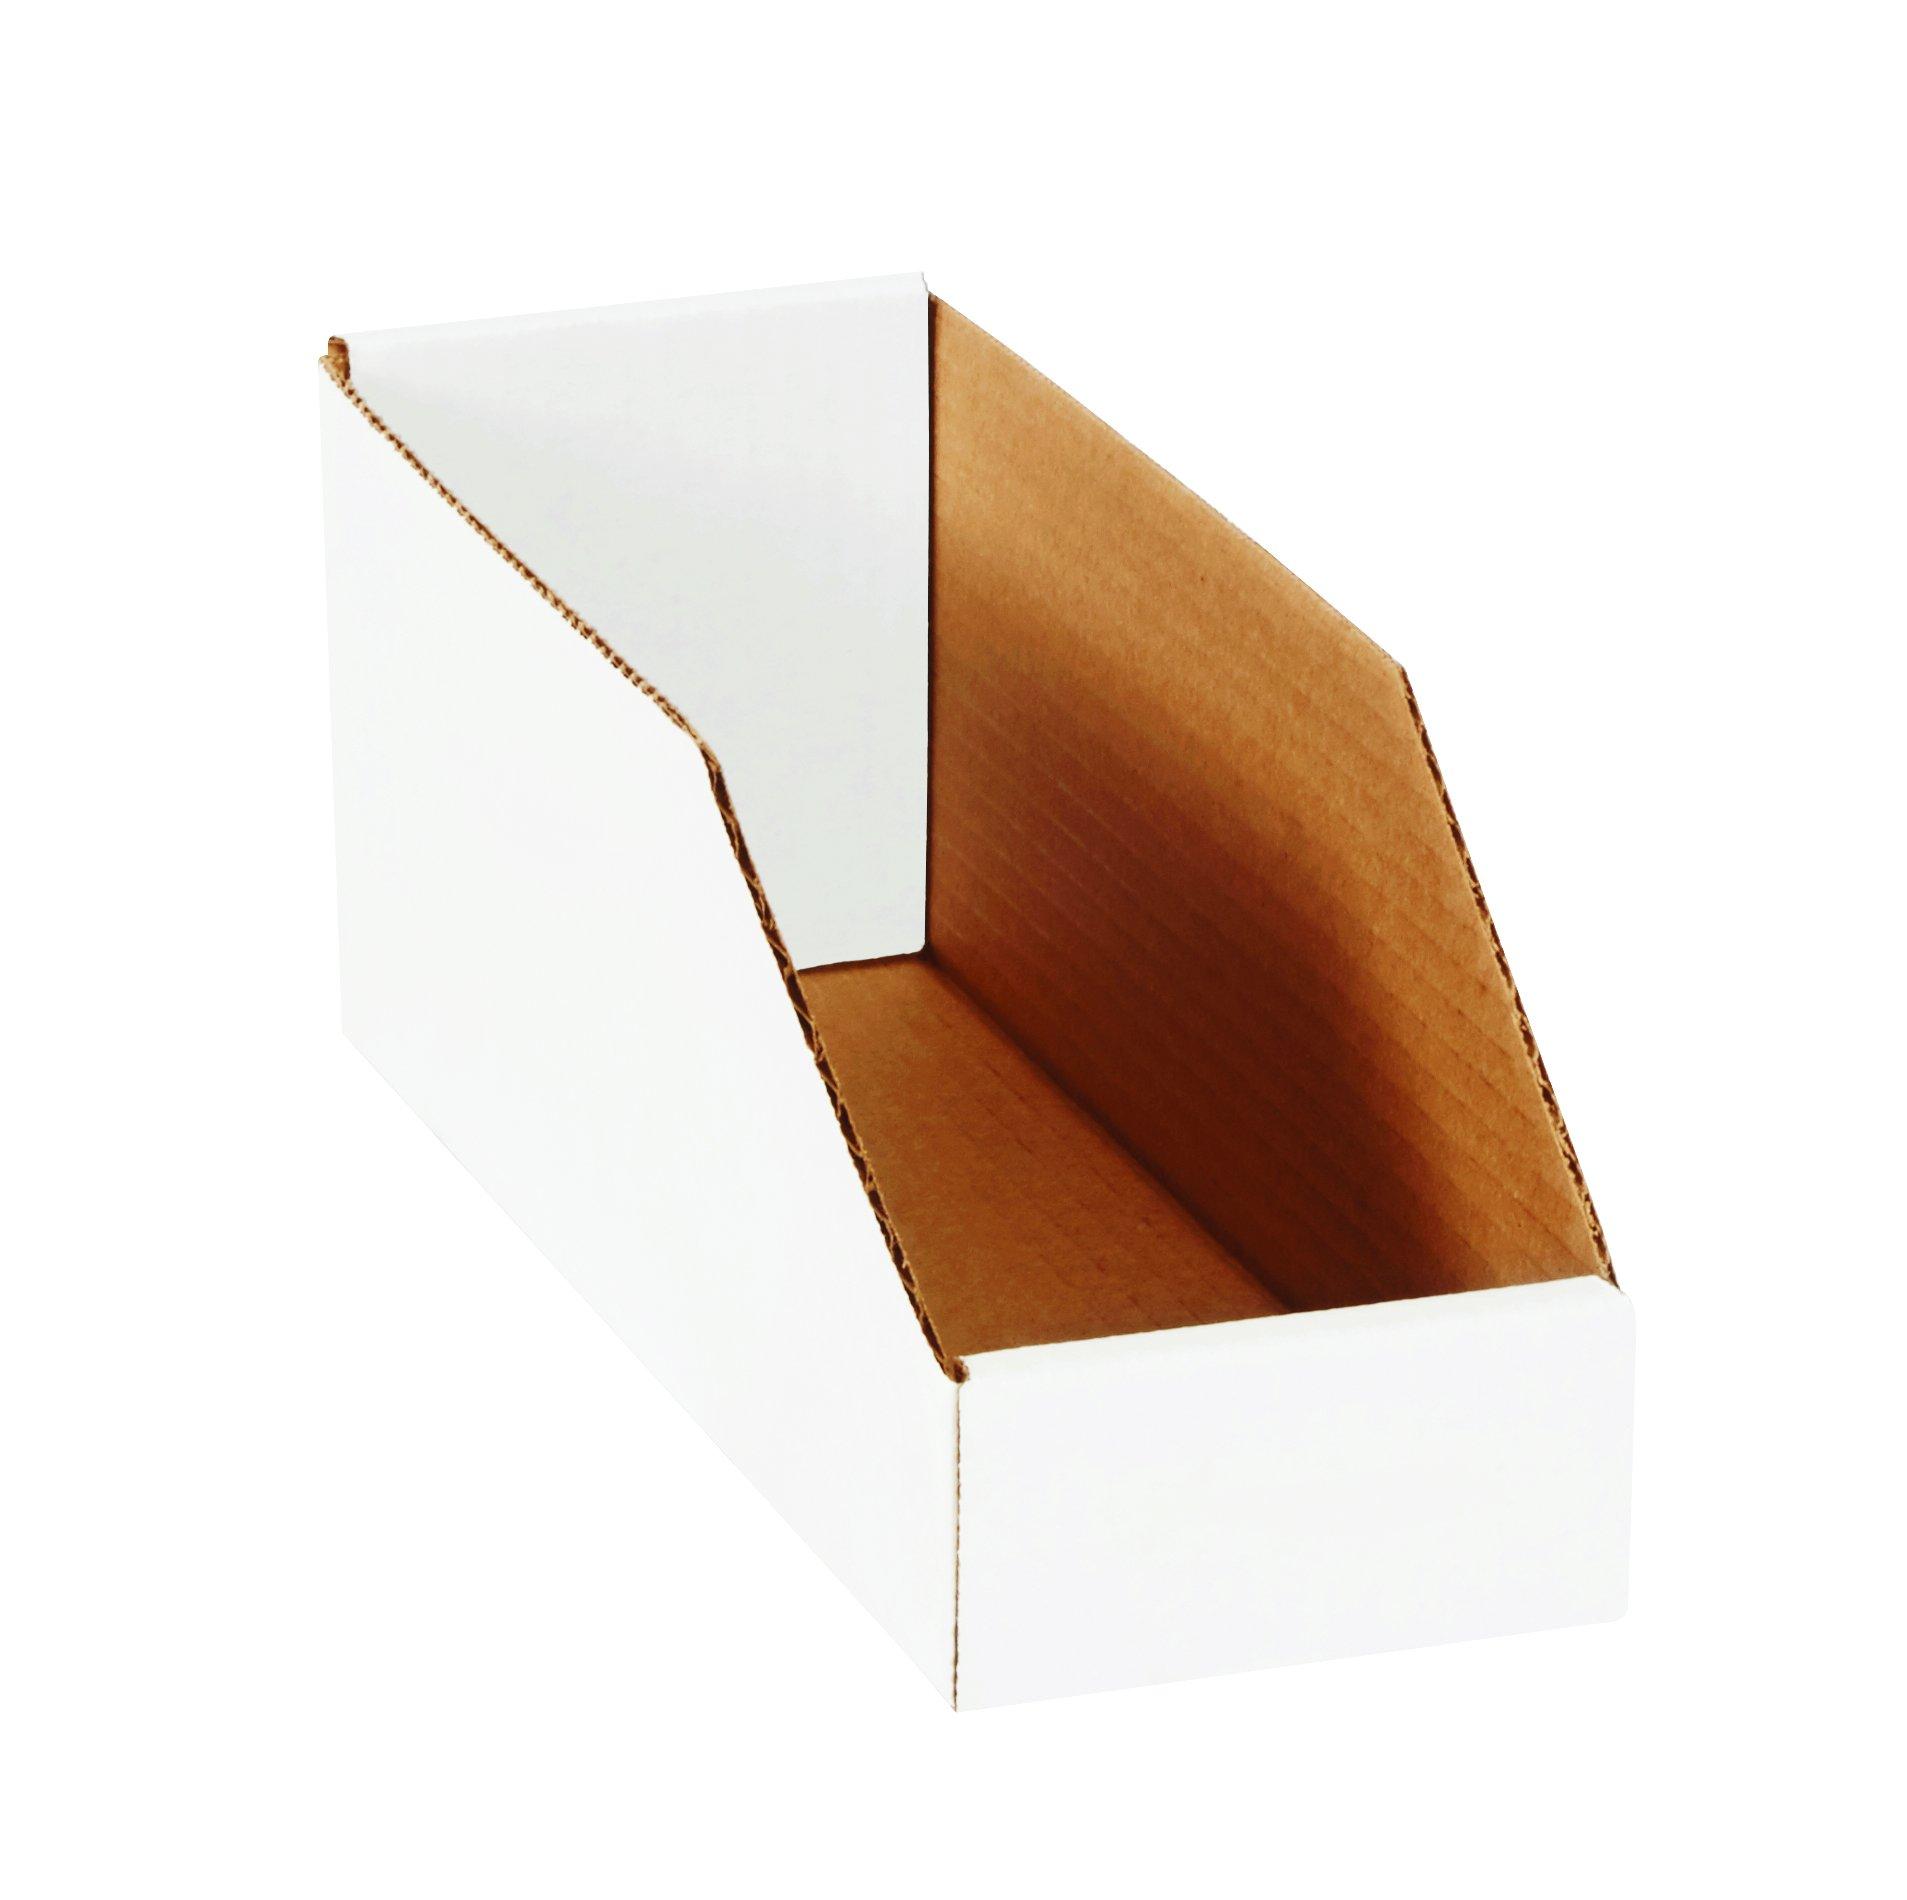 Aviditi BINMT412 Corrugated Open Top Bin Box, 12'' Length x 4'' Width x 4-1/2'' Height, Oyster White (Case of 50)